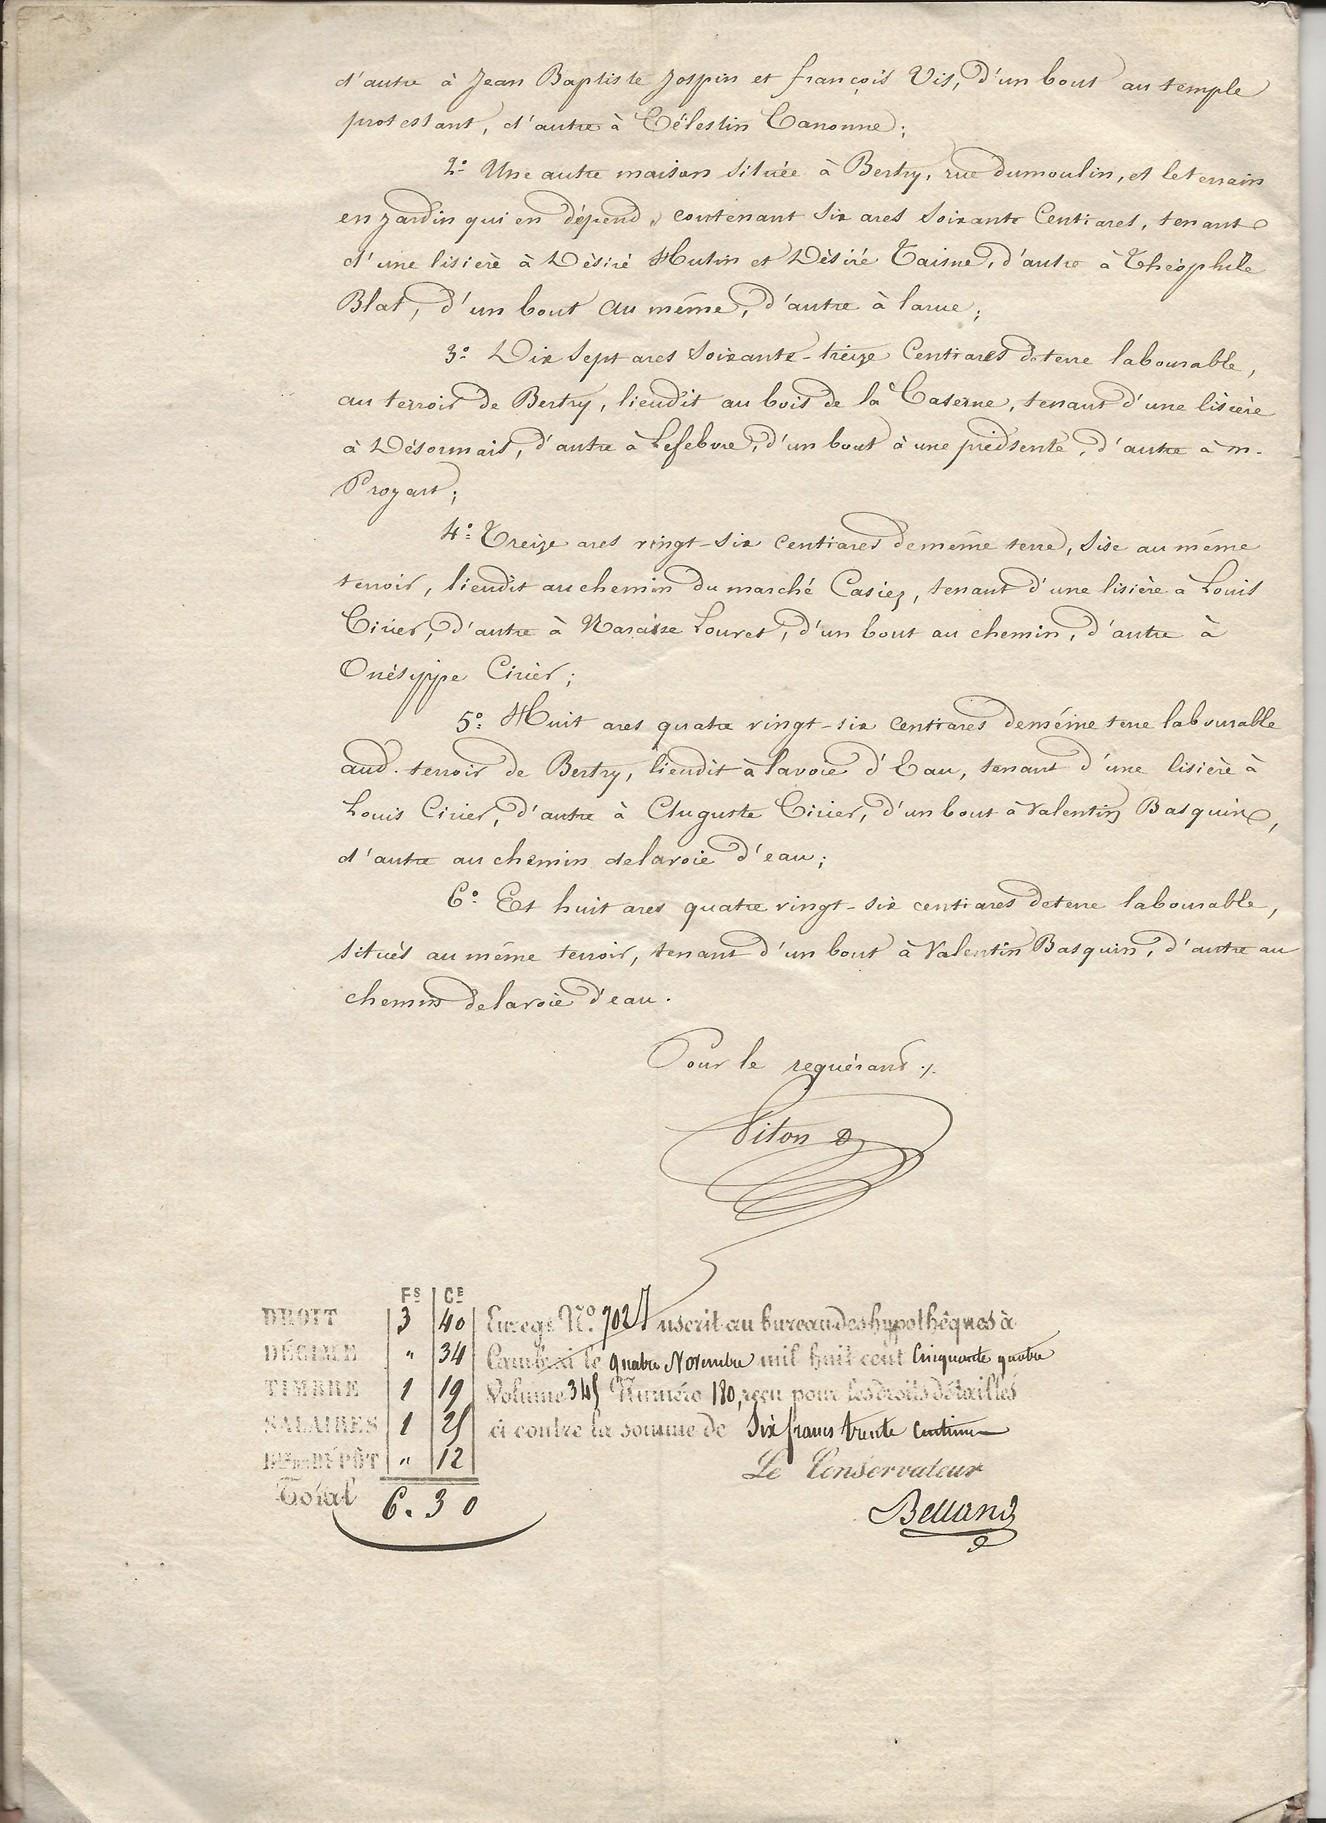 1854 emprunt hypothecaire jospin a leger plusquin 008